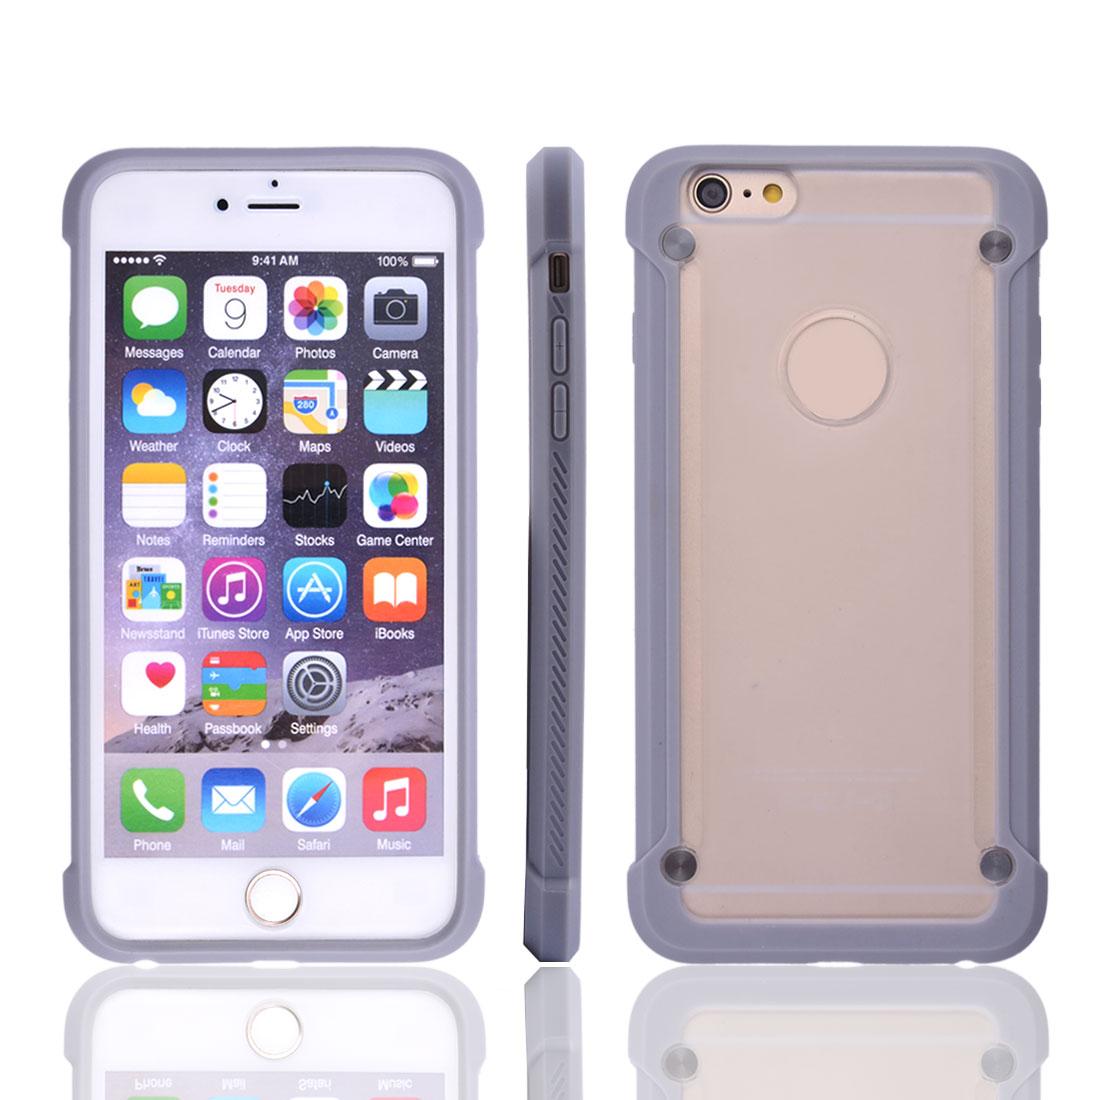 Smartphone Plastic Durable Transparent Back Phone Case Gray for Iphone 6 Plus